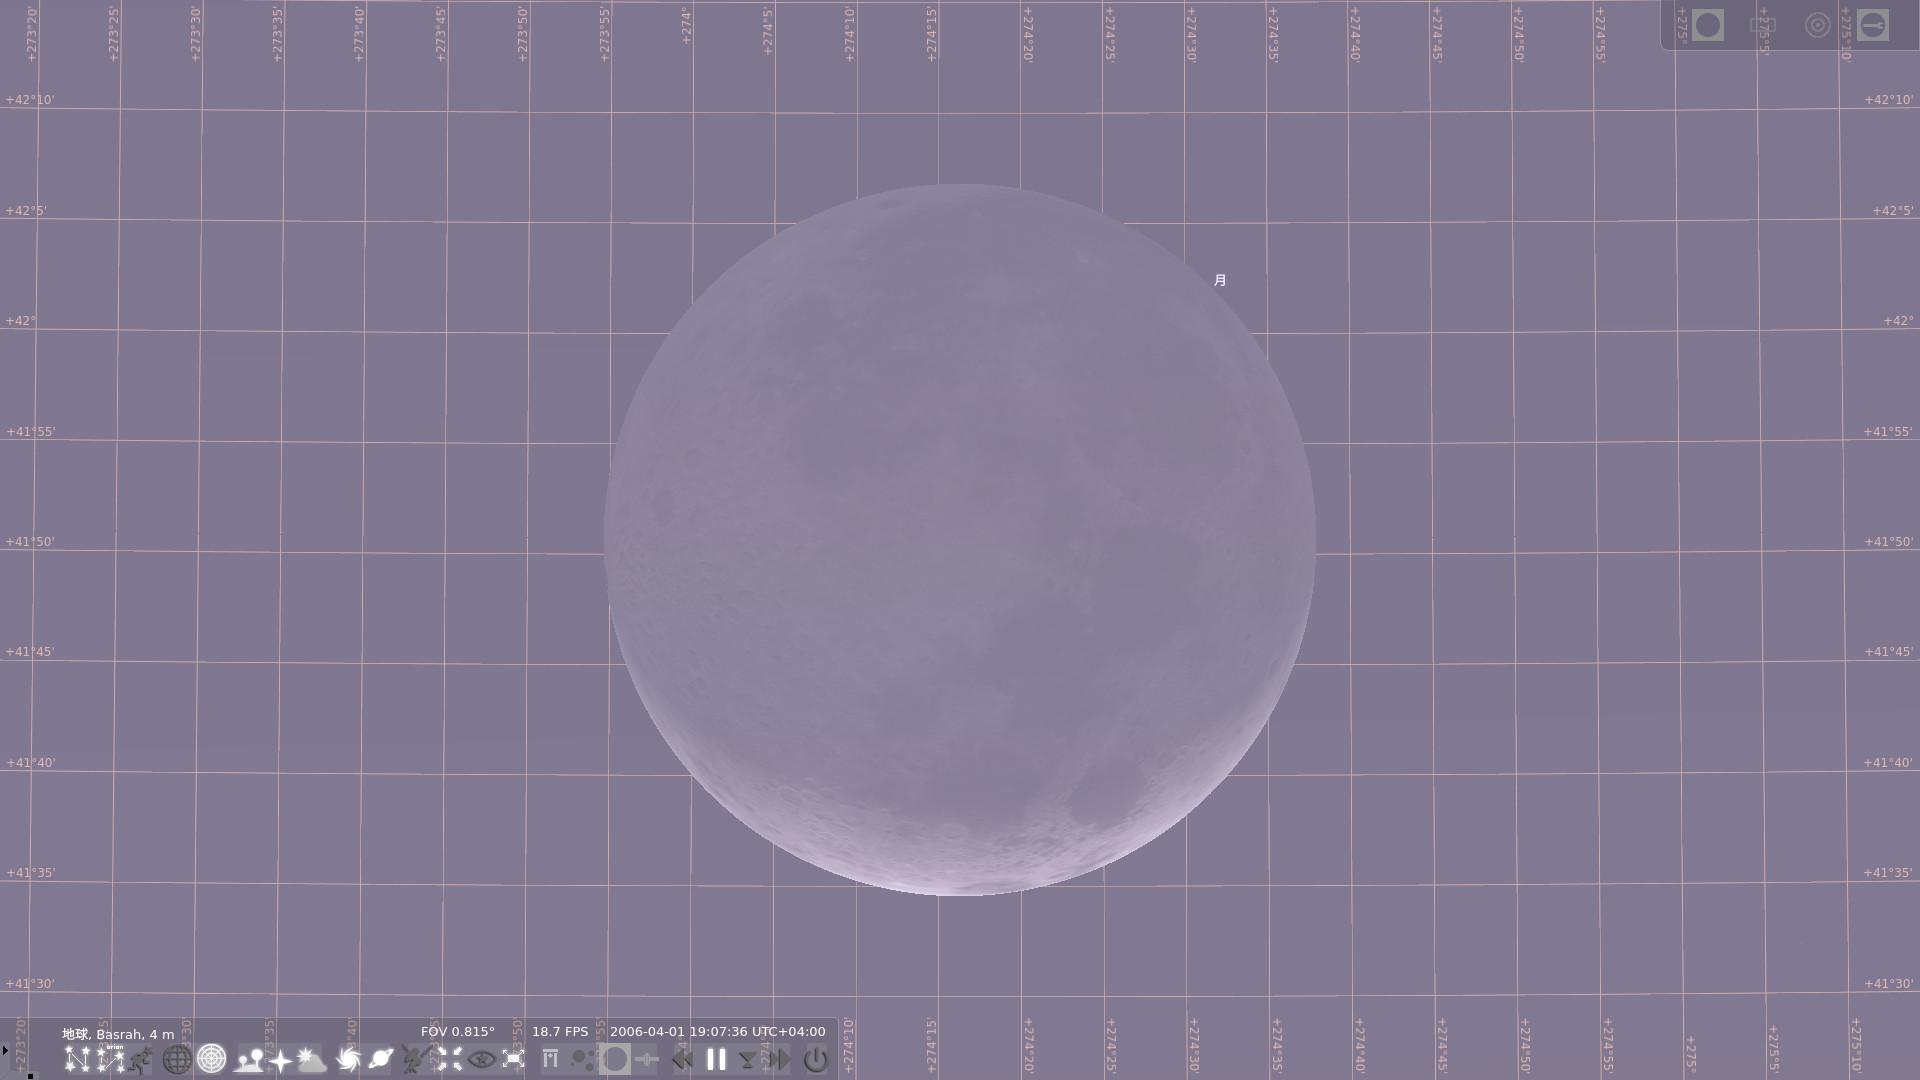 https://rna.sakura.ne.jp/share/stellarium-moon-20060401-Basrah.jpg